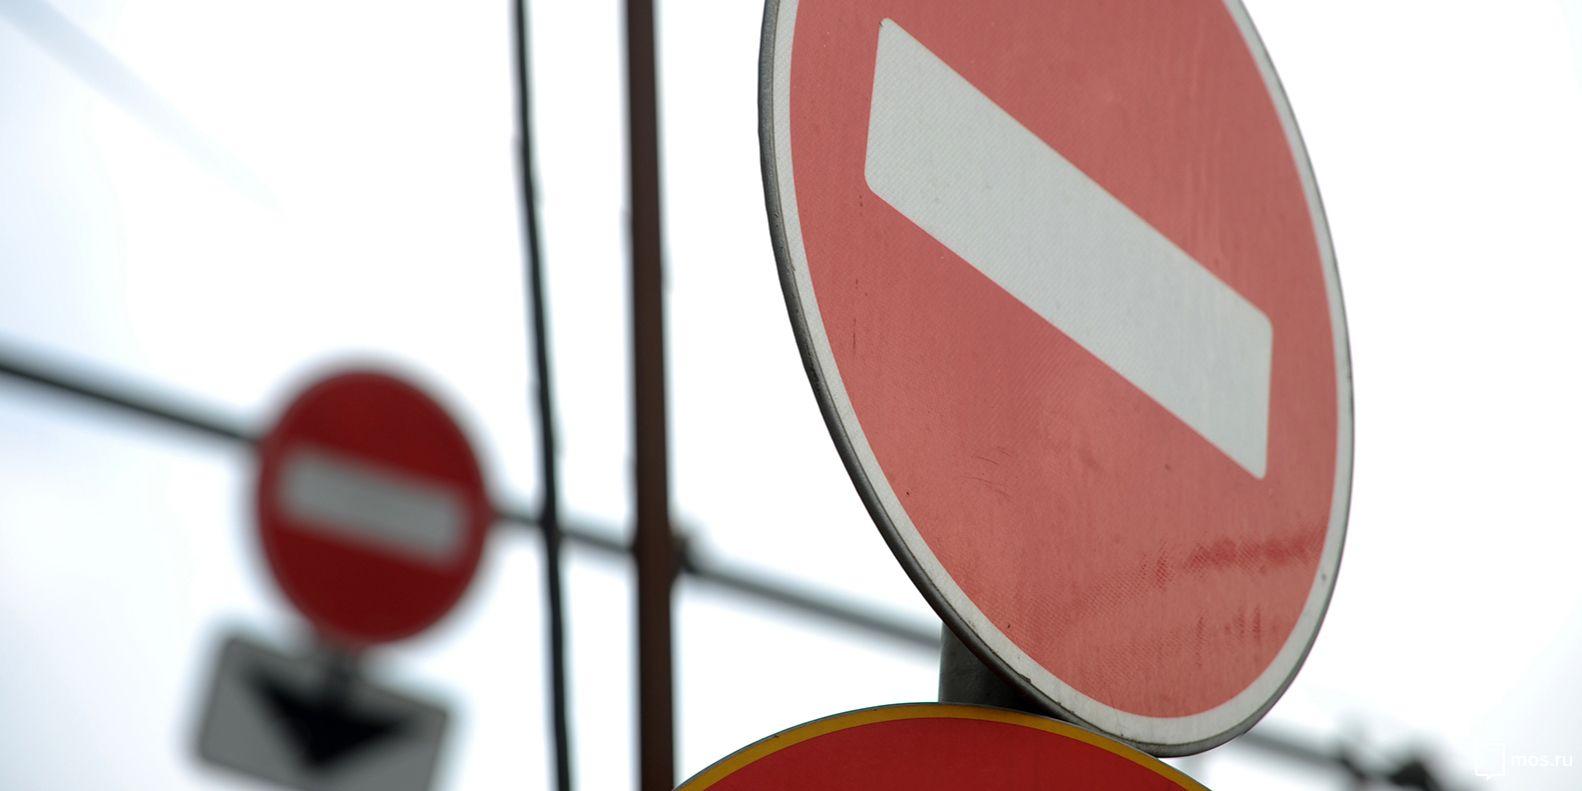 Москва на три месяца ограничит движение в районе Косинского шоссе